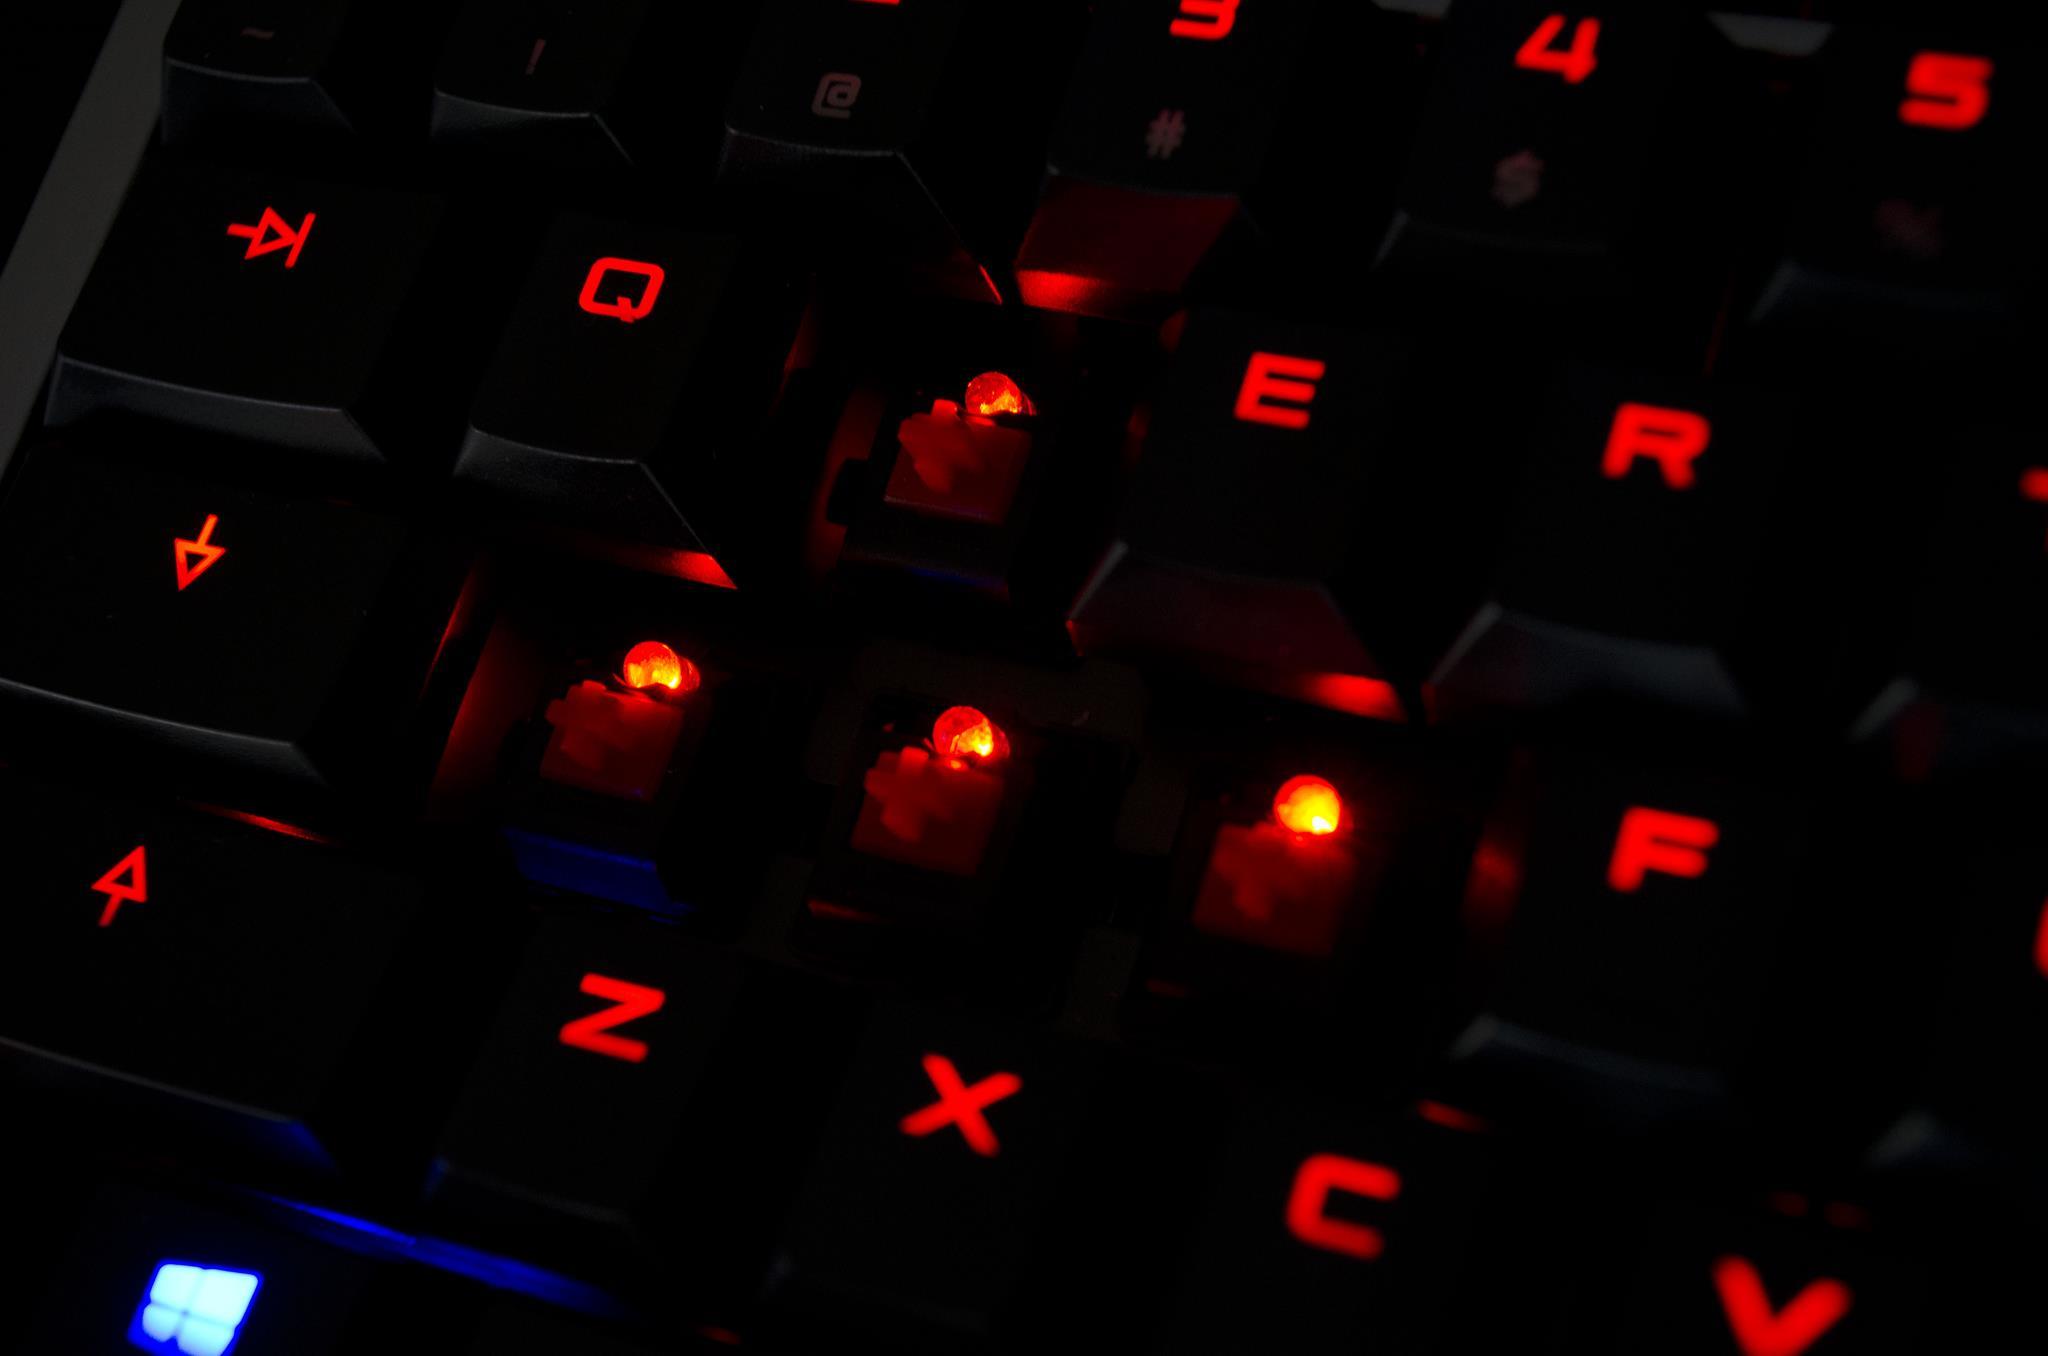 cherry mx-board 6 mechanical keyboard review_3